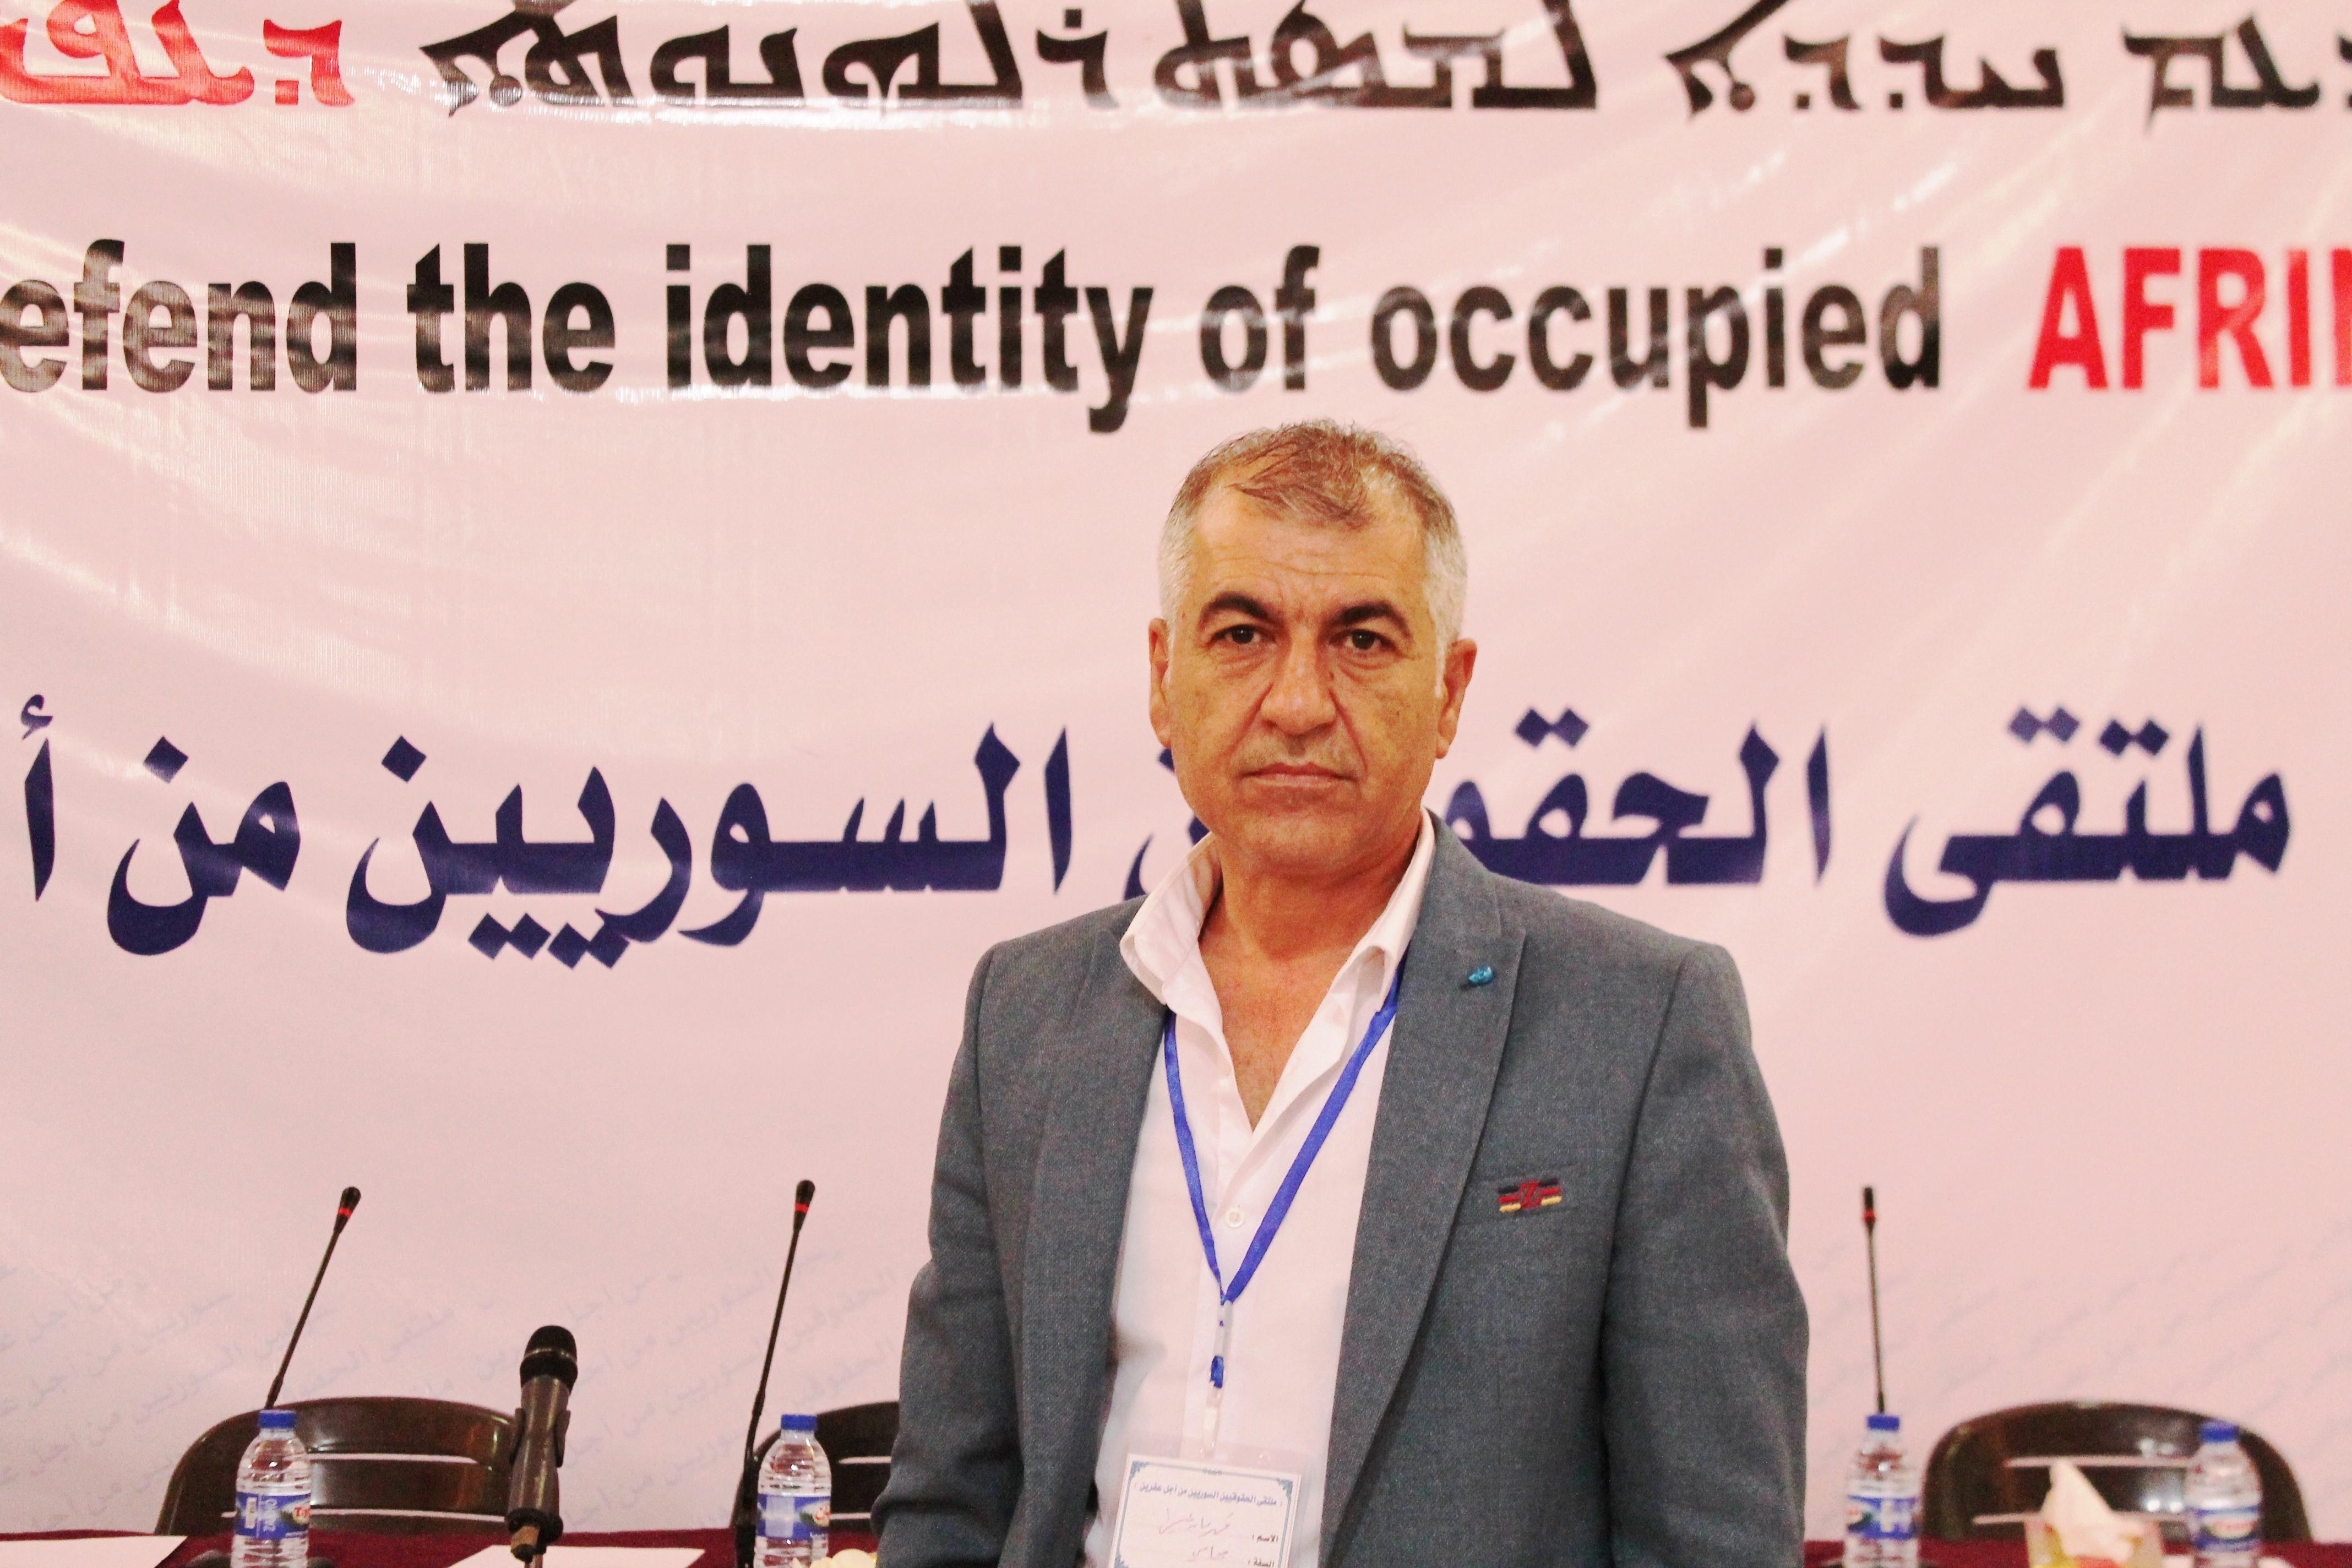 Photo of قهرمان عيسى: يجب محاسبة النظام التركي على جرائمه العدوانية